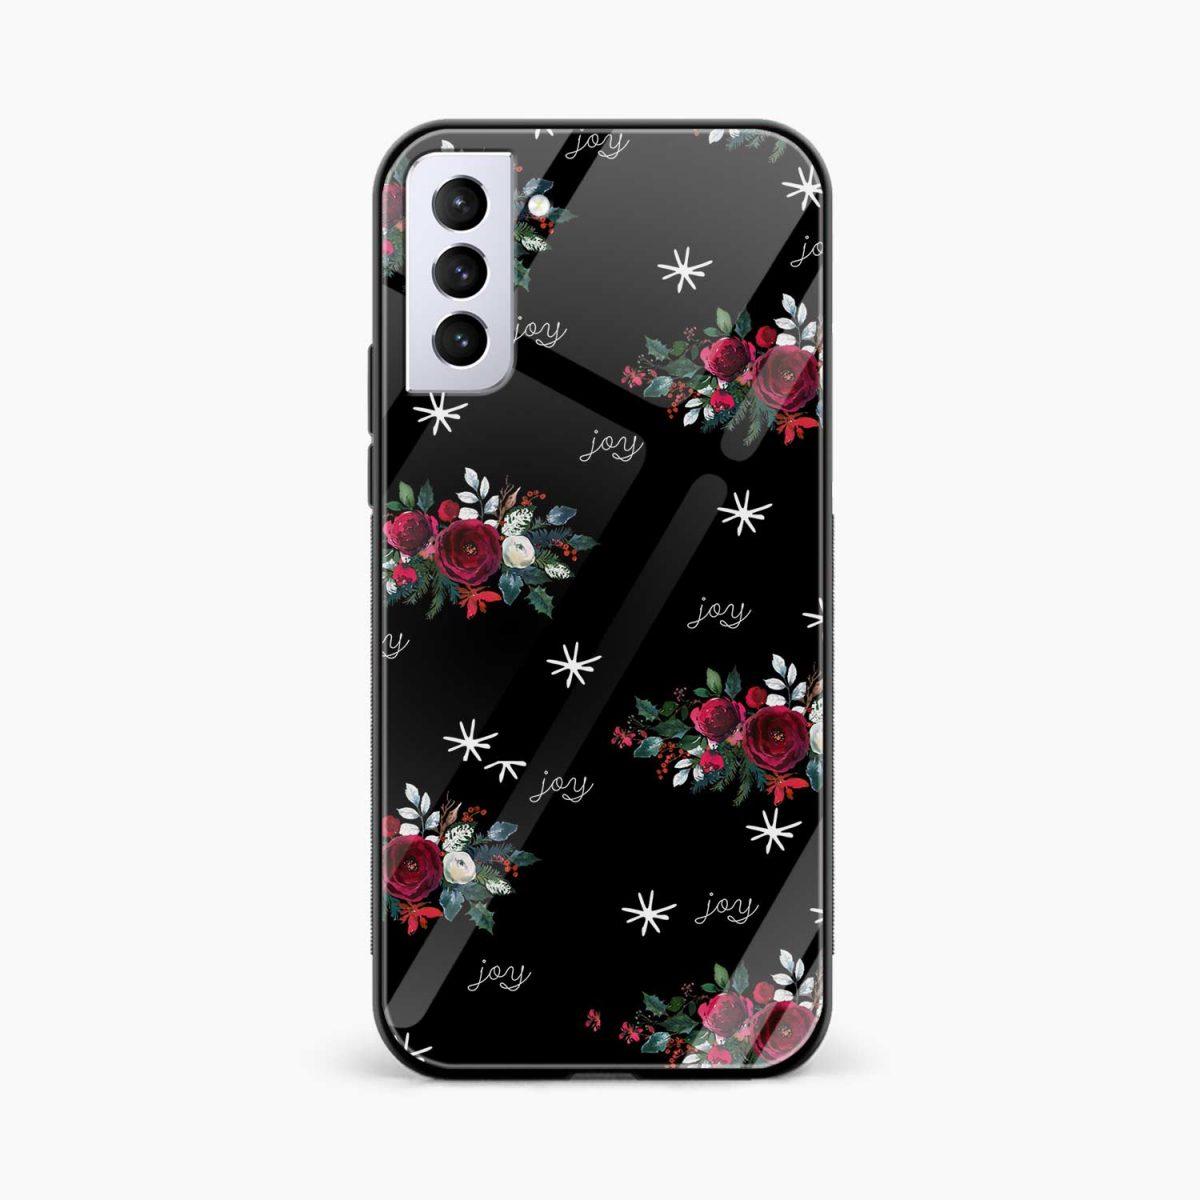 joy floral black colored front view samsung s21 plug back cover